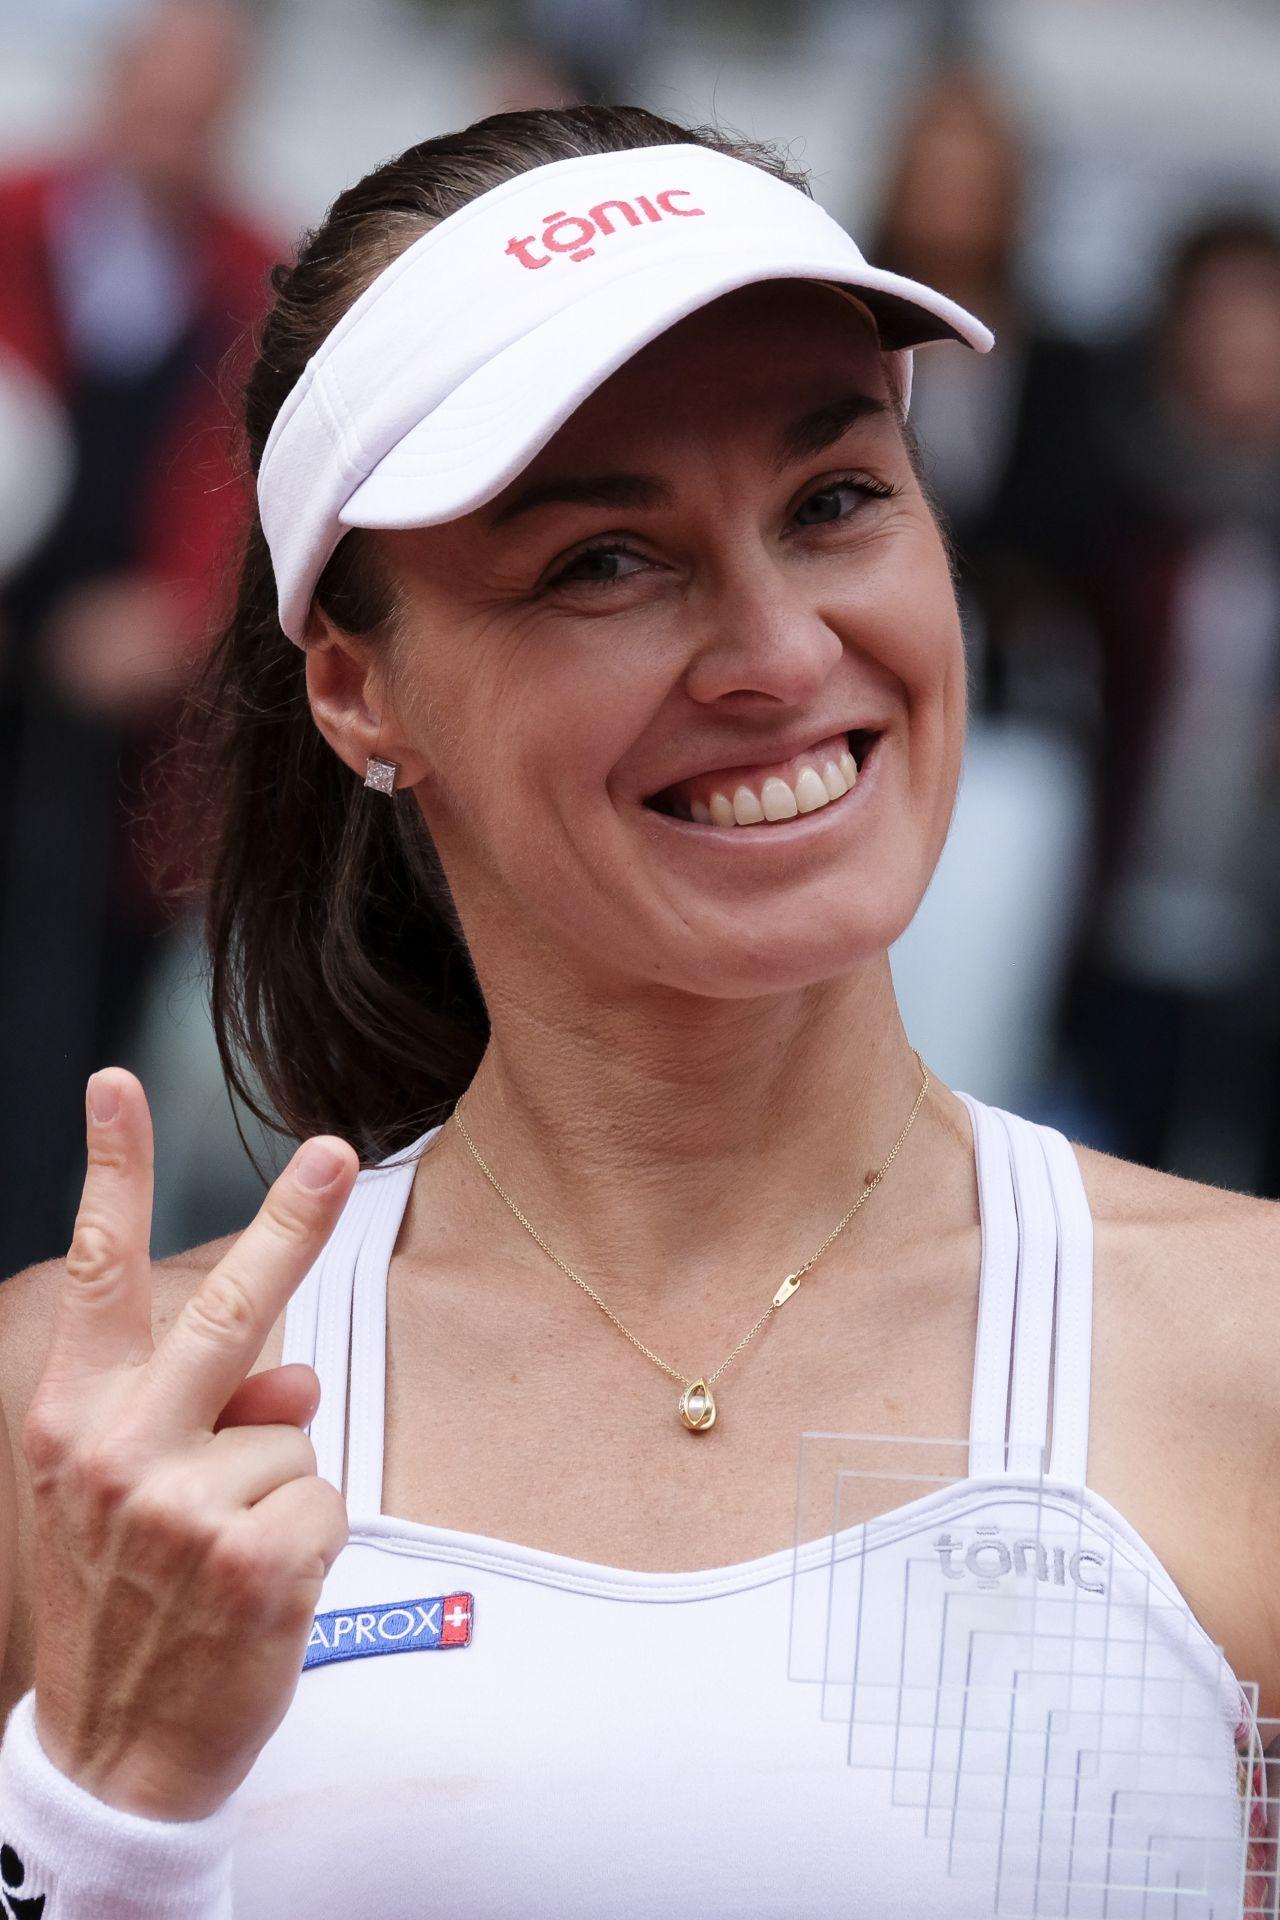 Ana Ivanovic Nude Pics pindan barrett on martina hingis | tennis stars, tennis